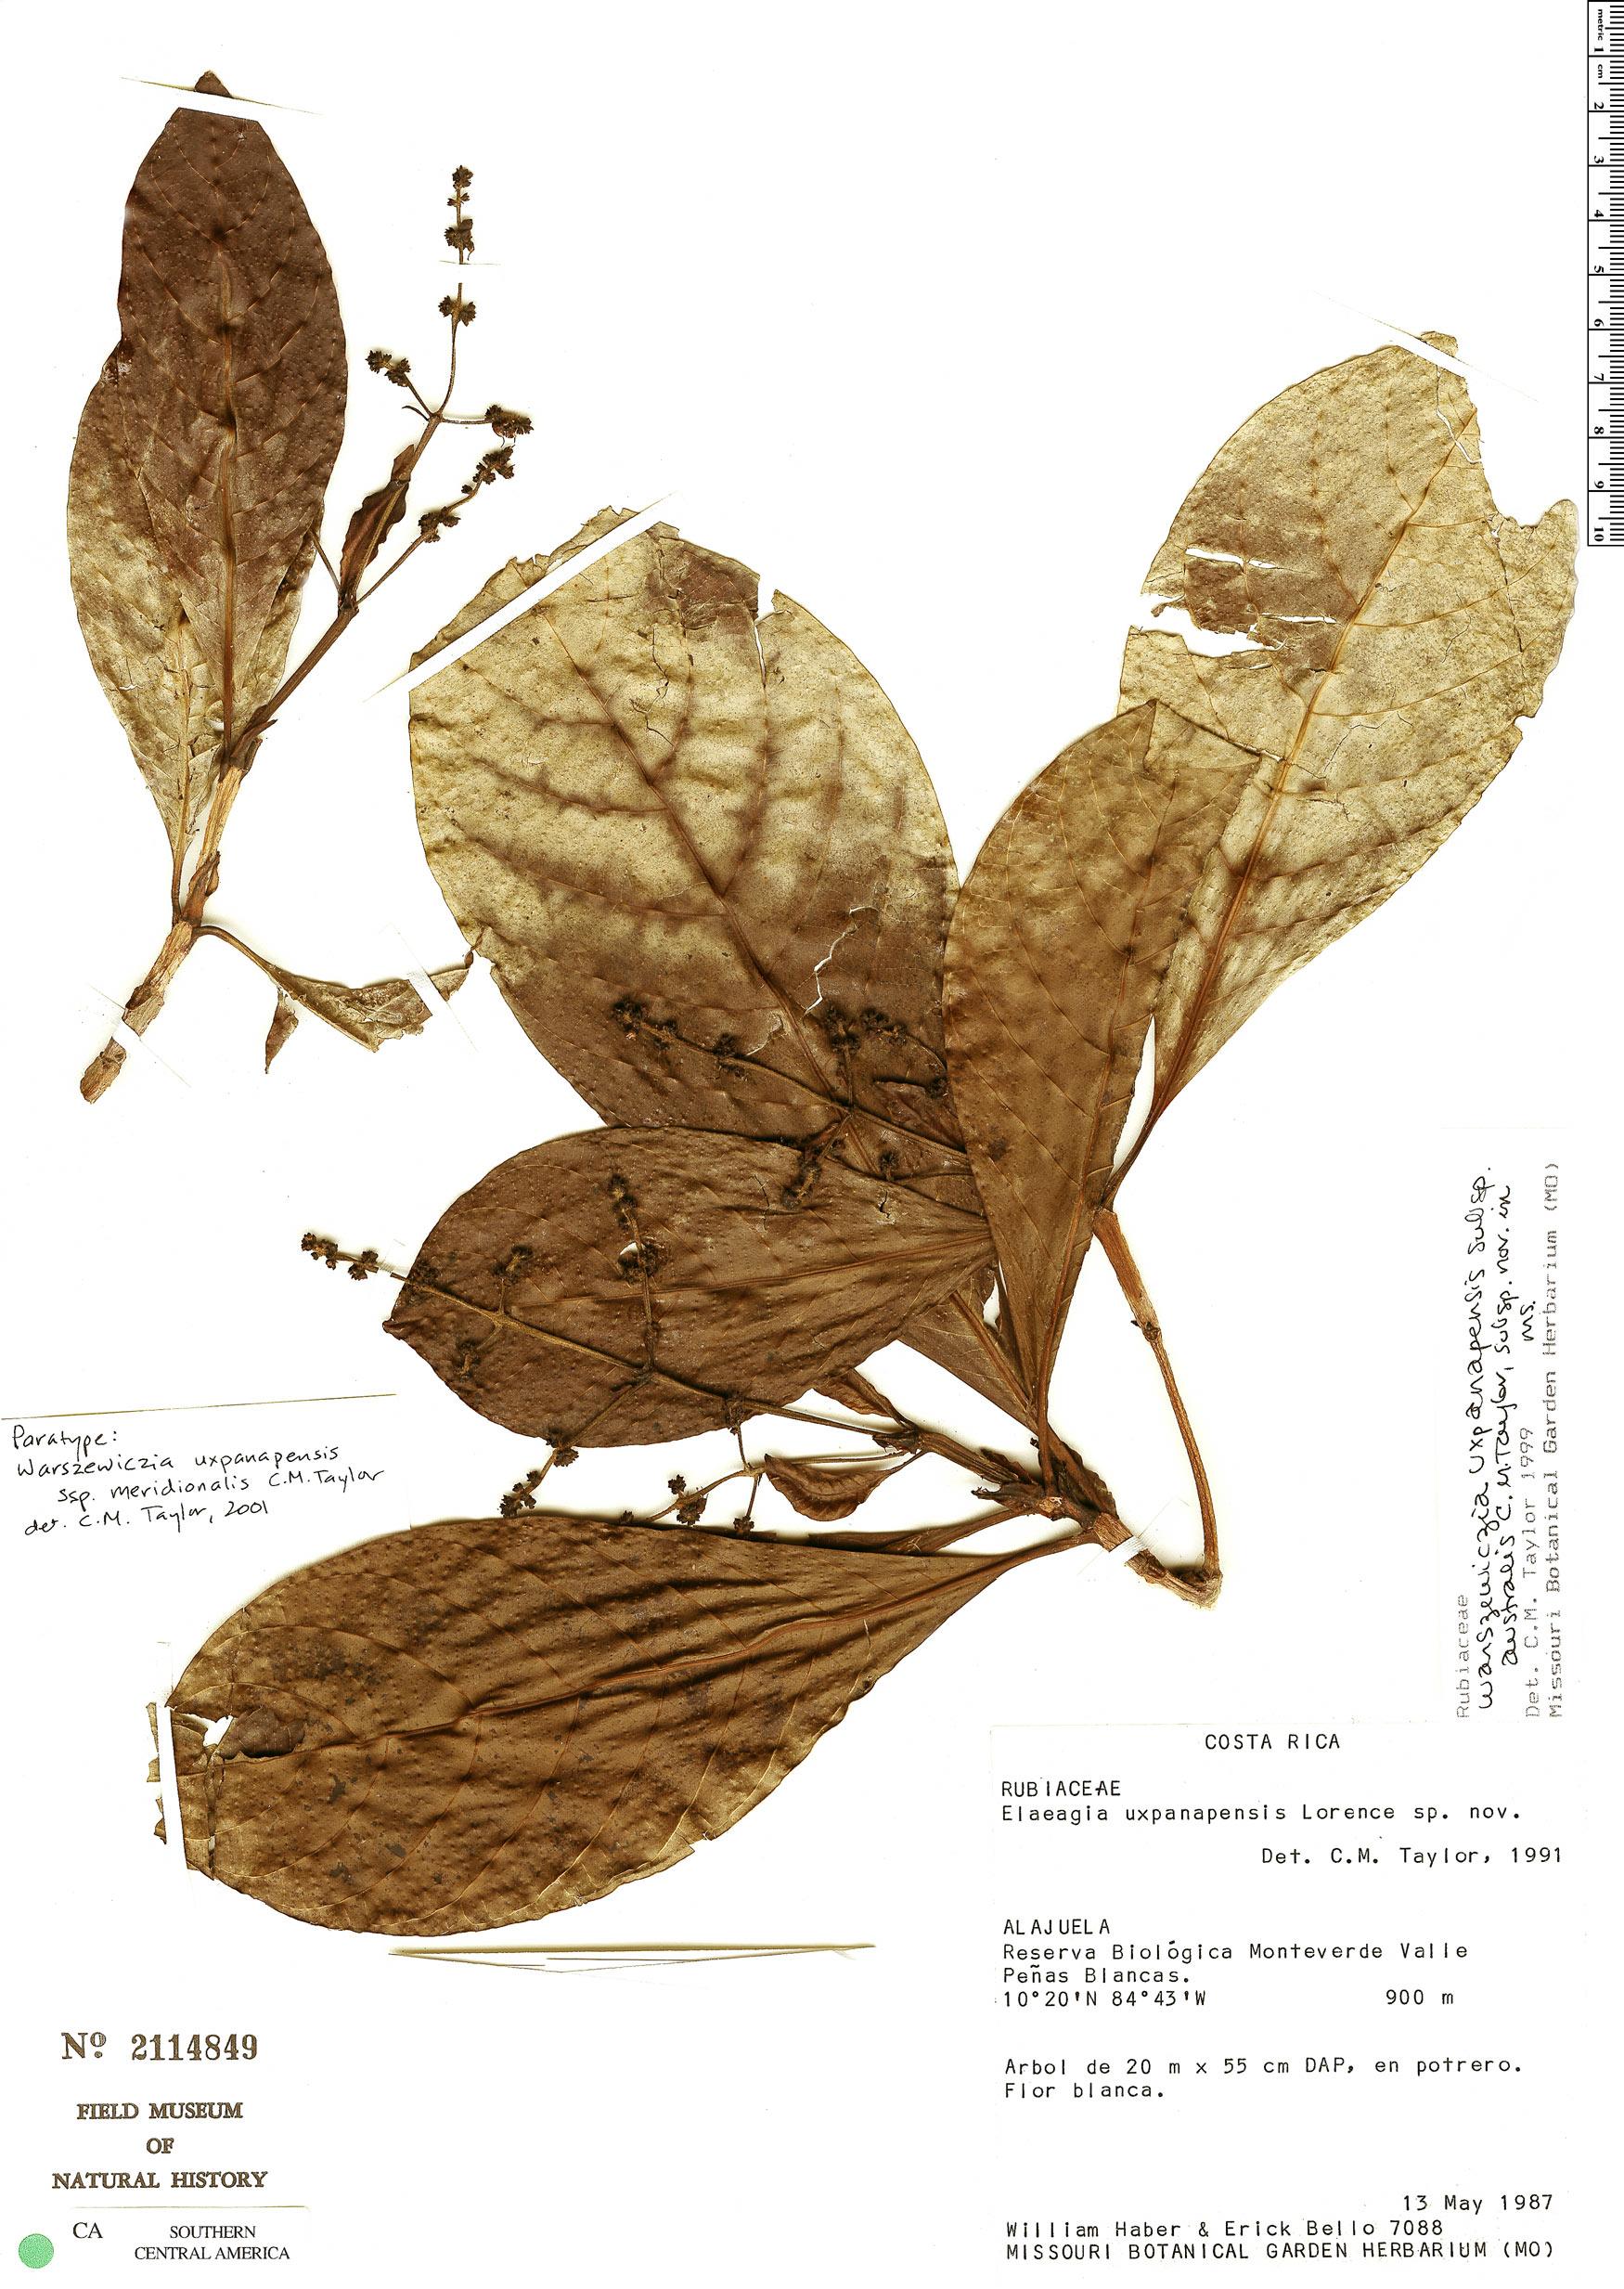 Warszewiczia uxpanapensis image